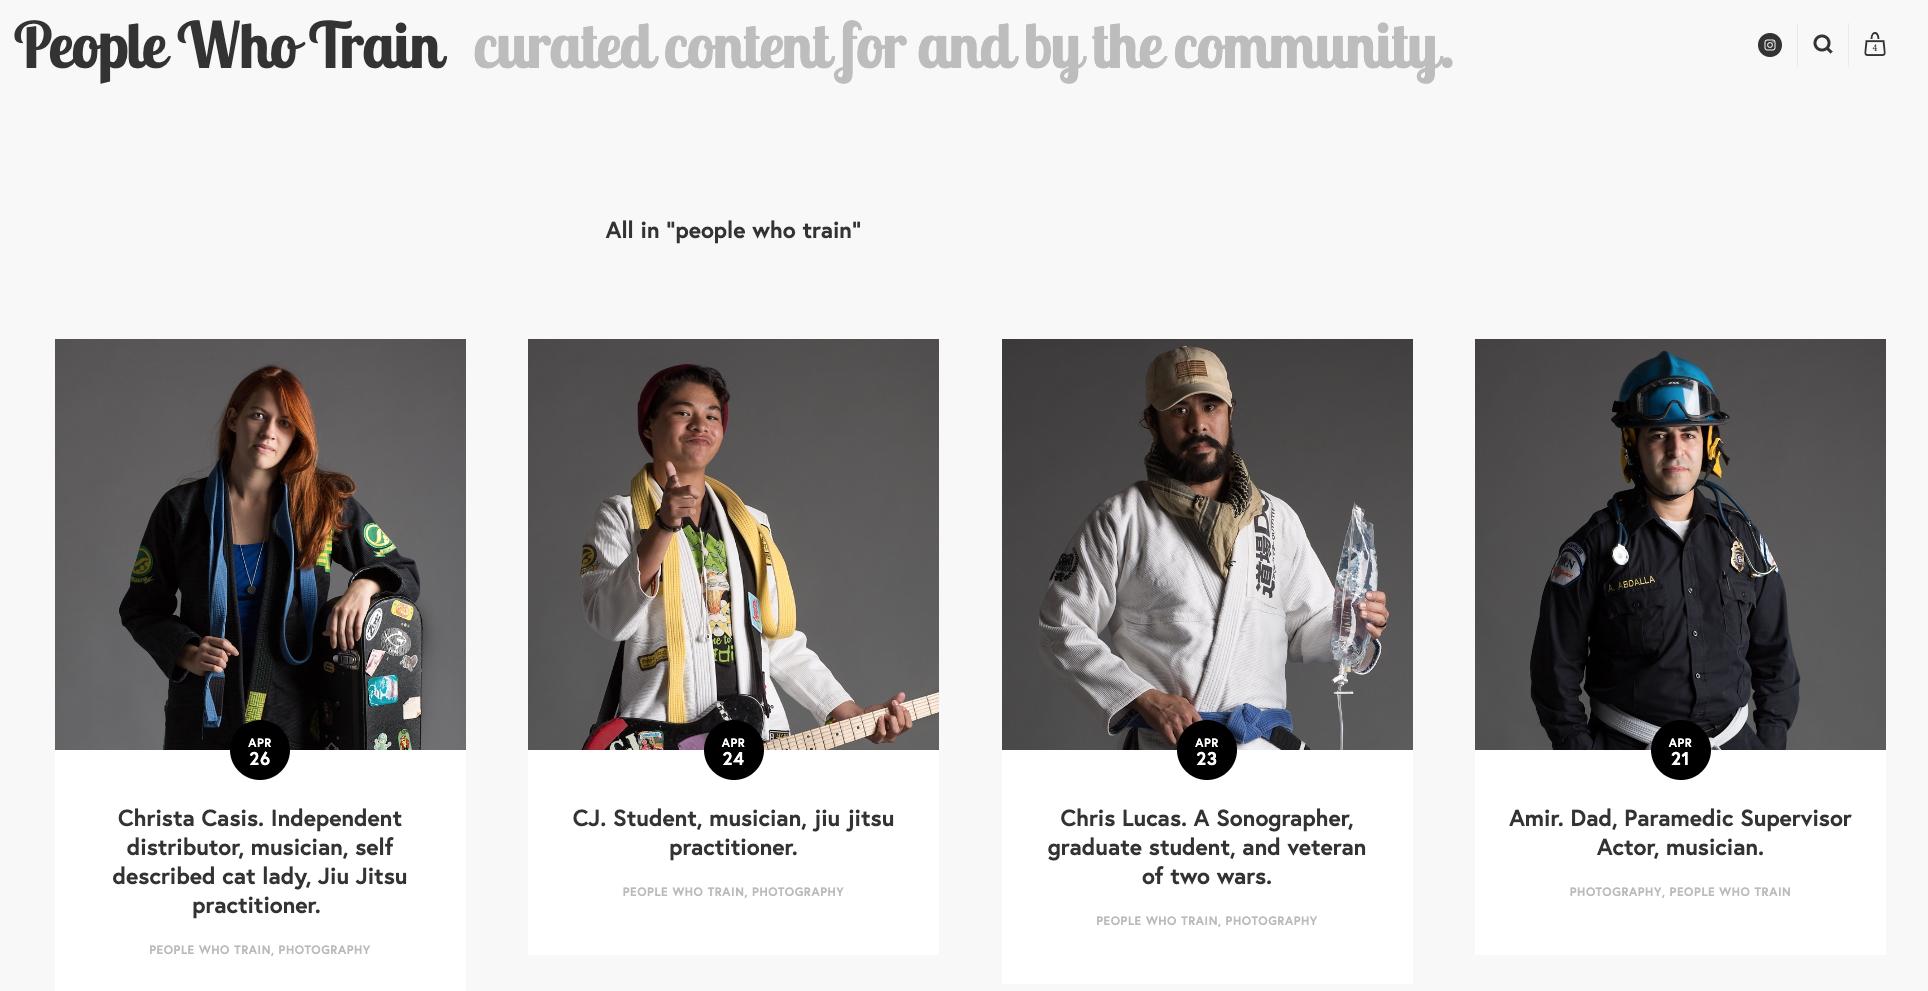 The People Who Train Project - Portraits of everyday Jiu Jitsu practitioners.